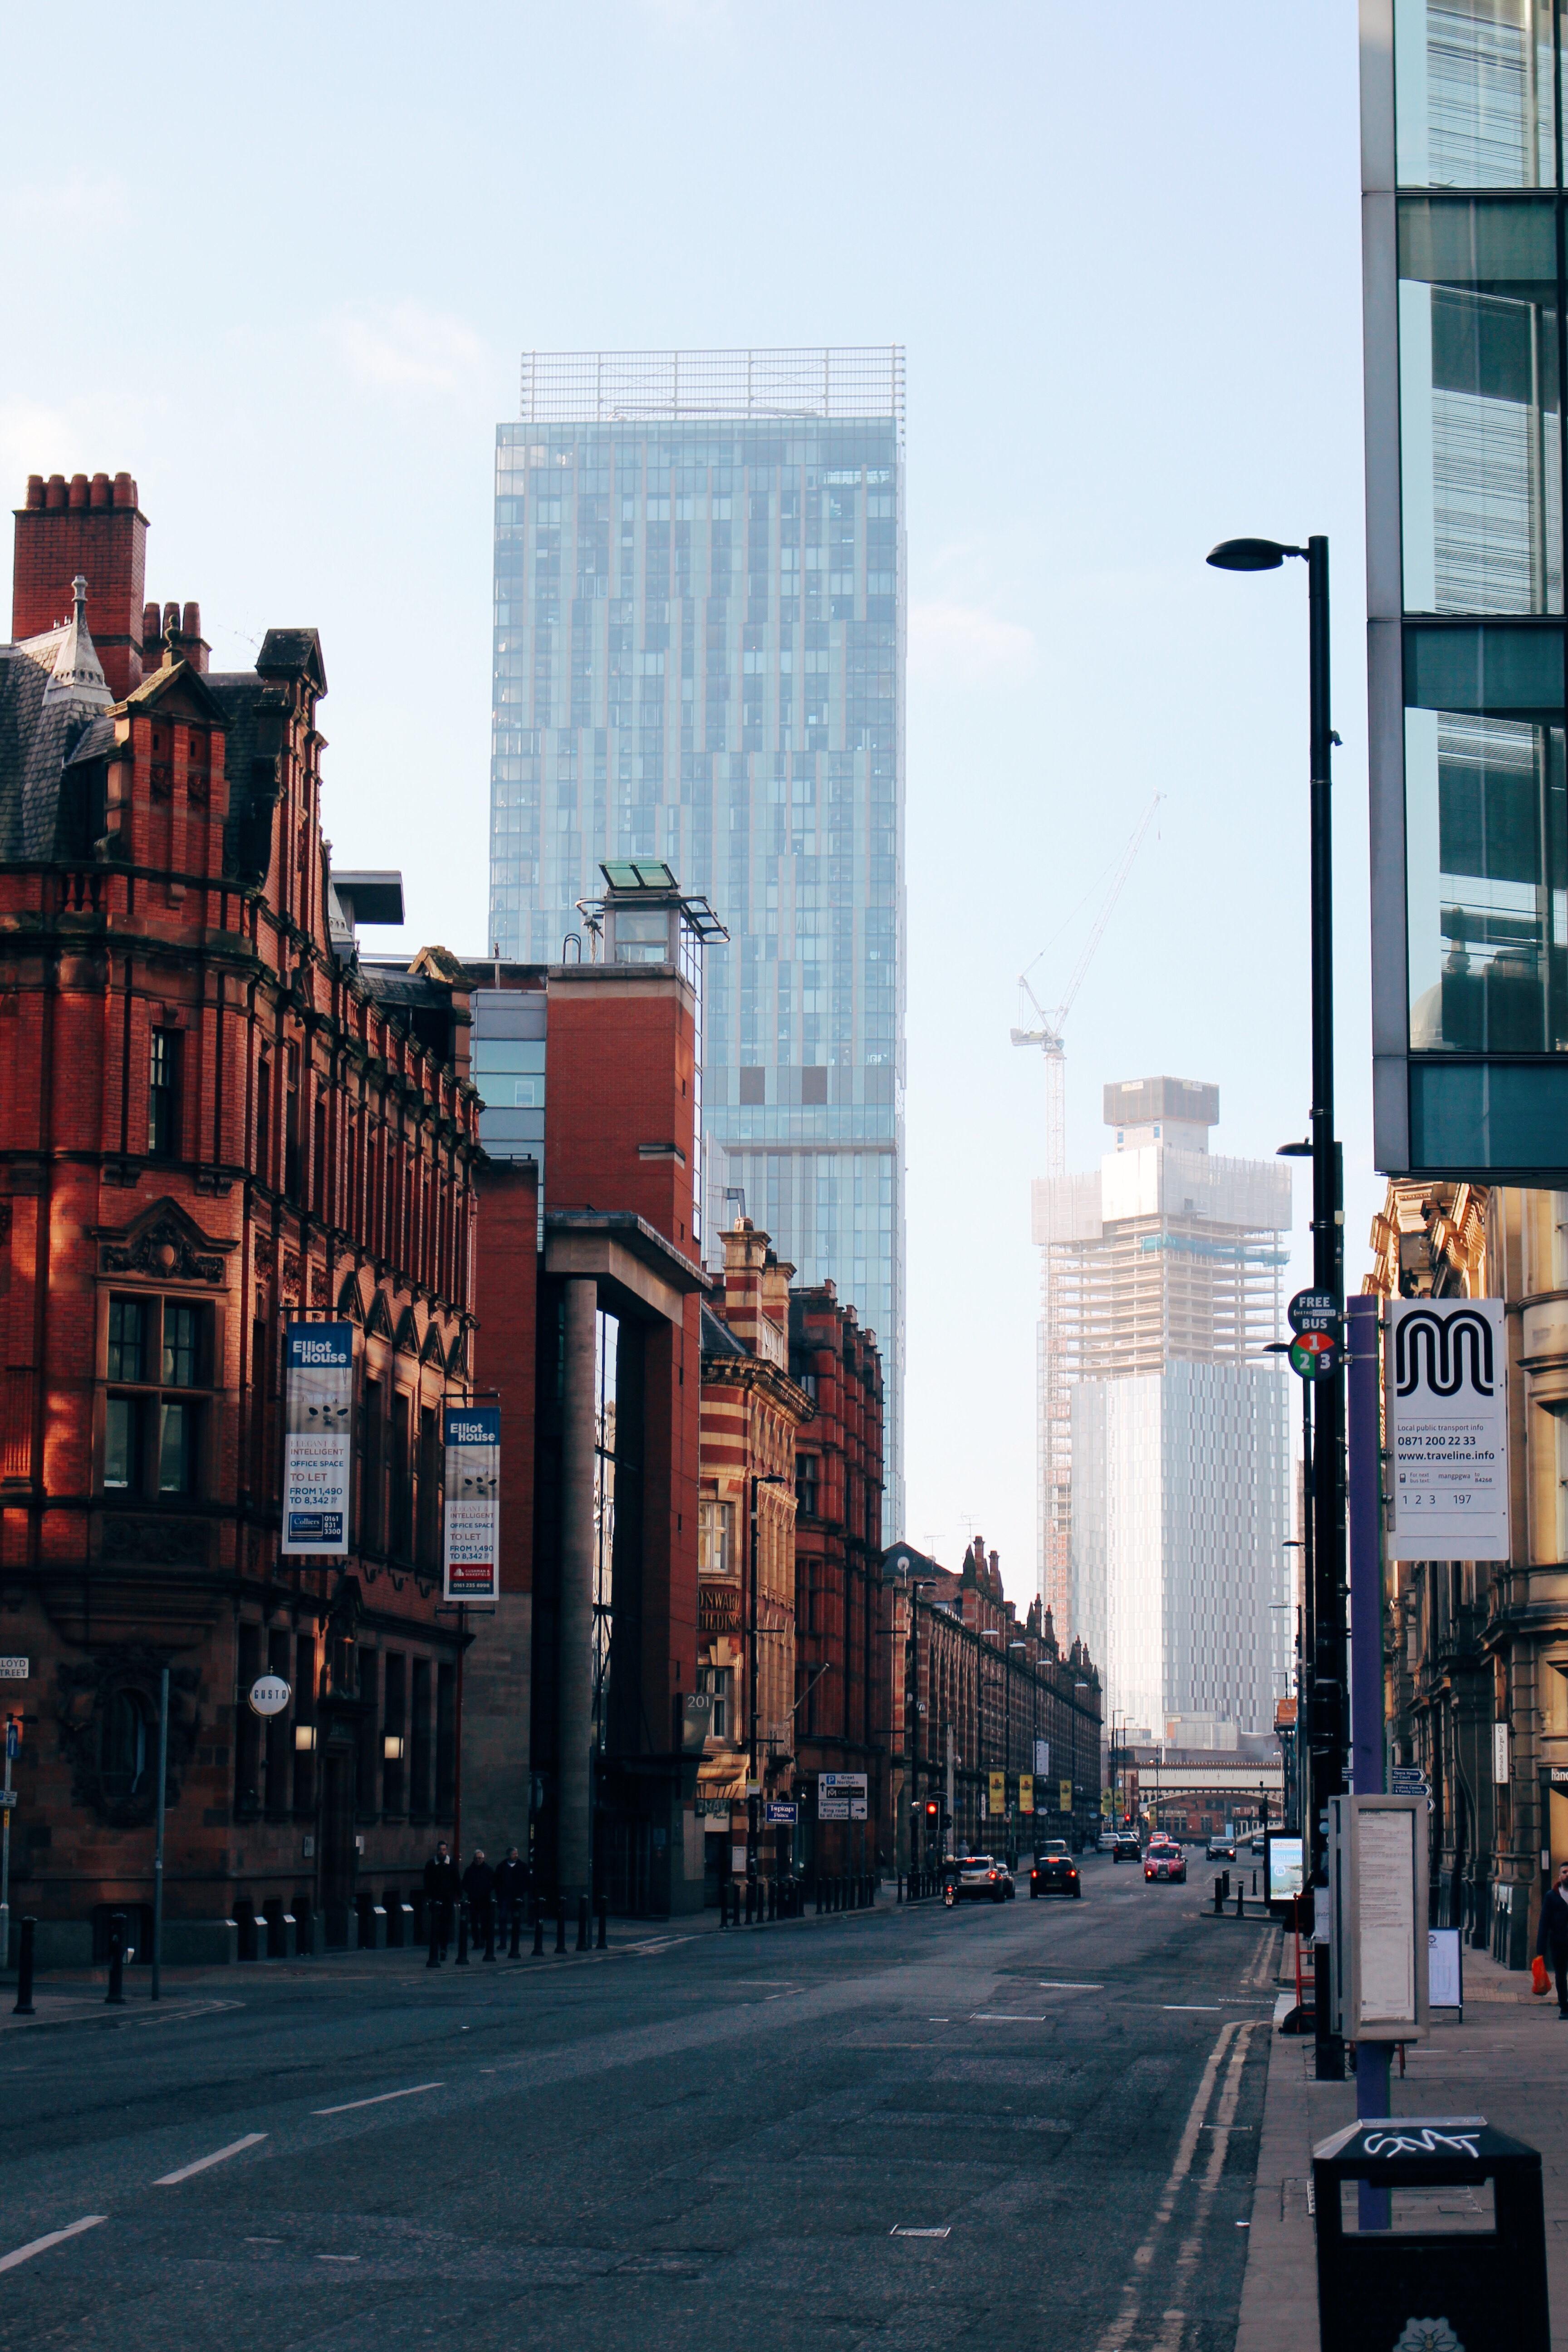 Manchester Architecture